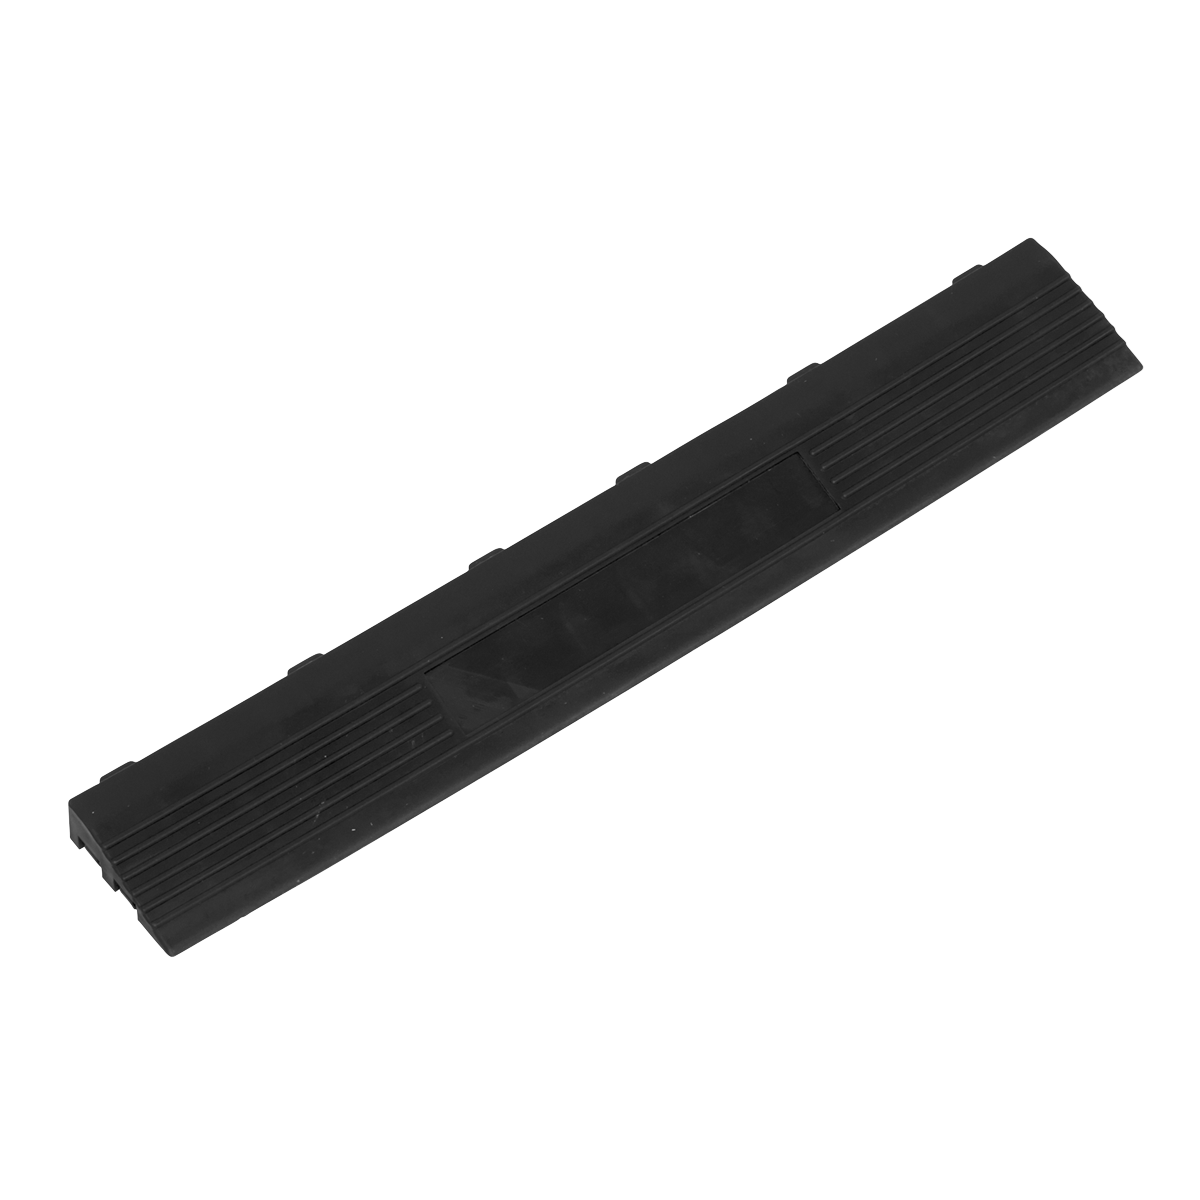 Sealey Polypropylene Floor Tile Edge 400 x 60mm Male - Pack of 6